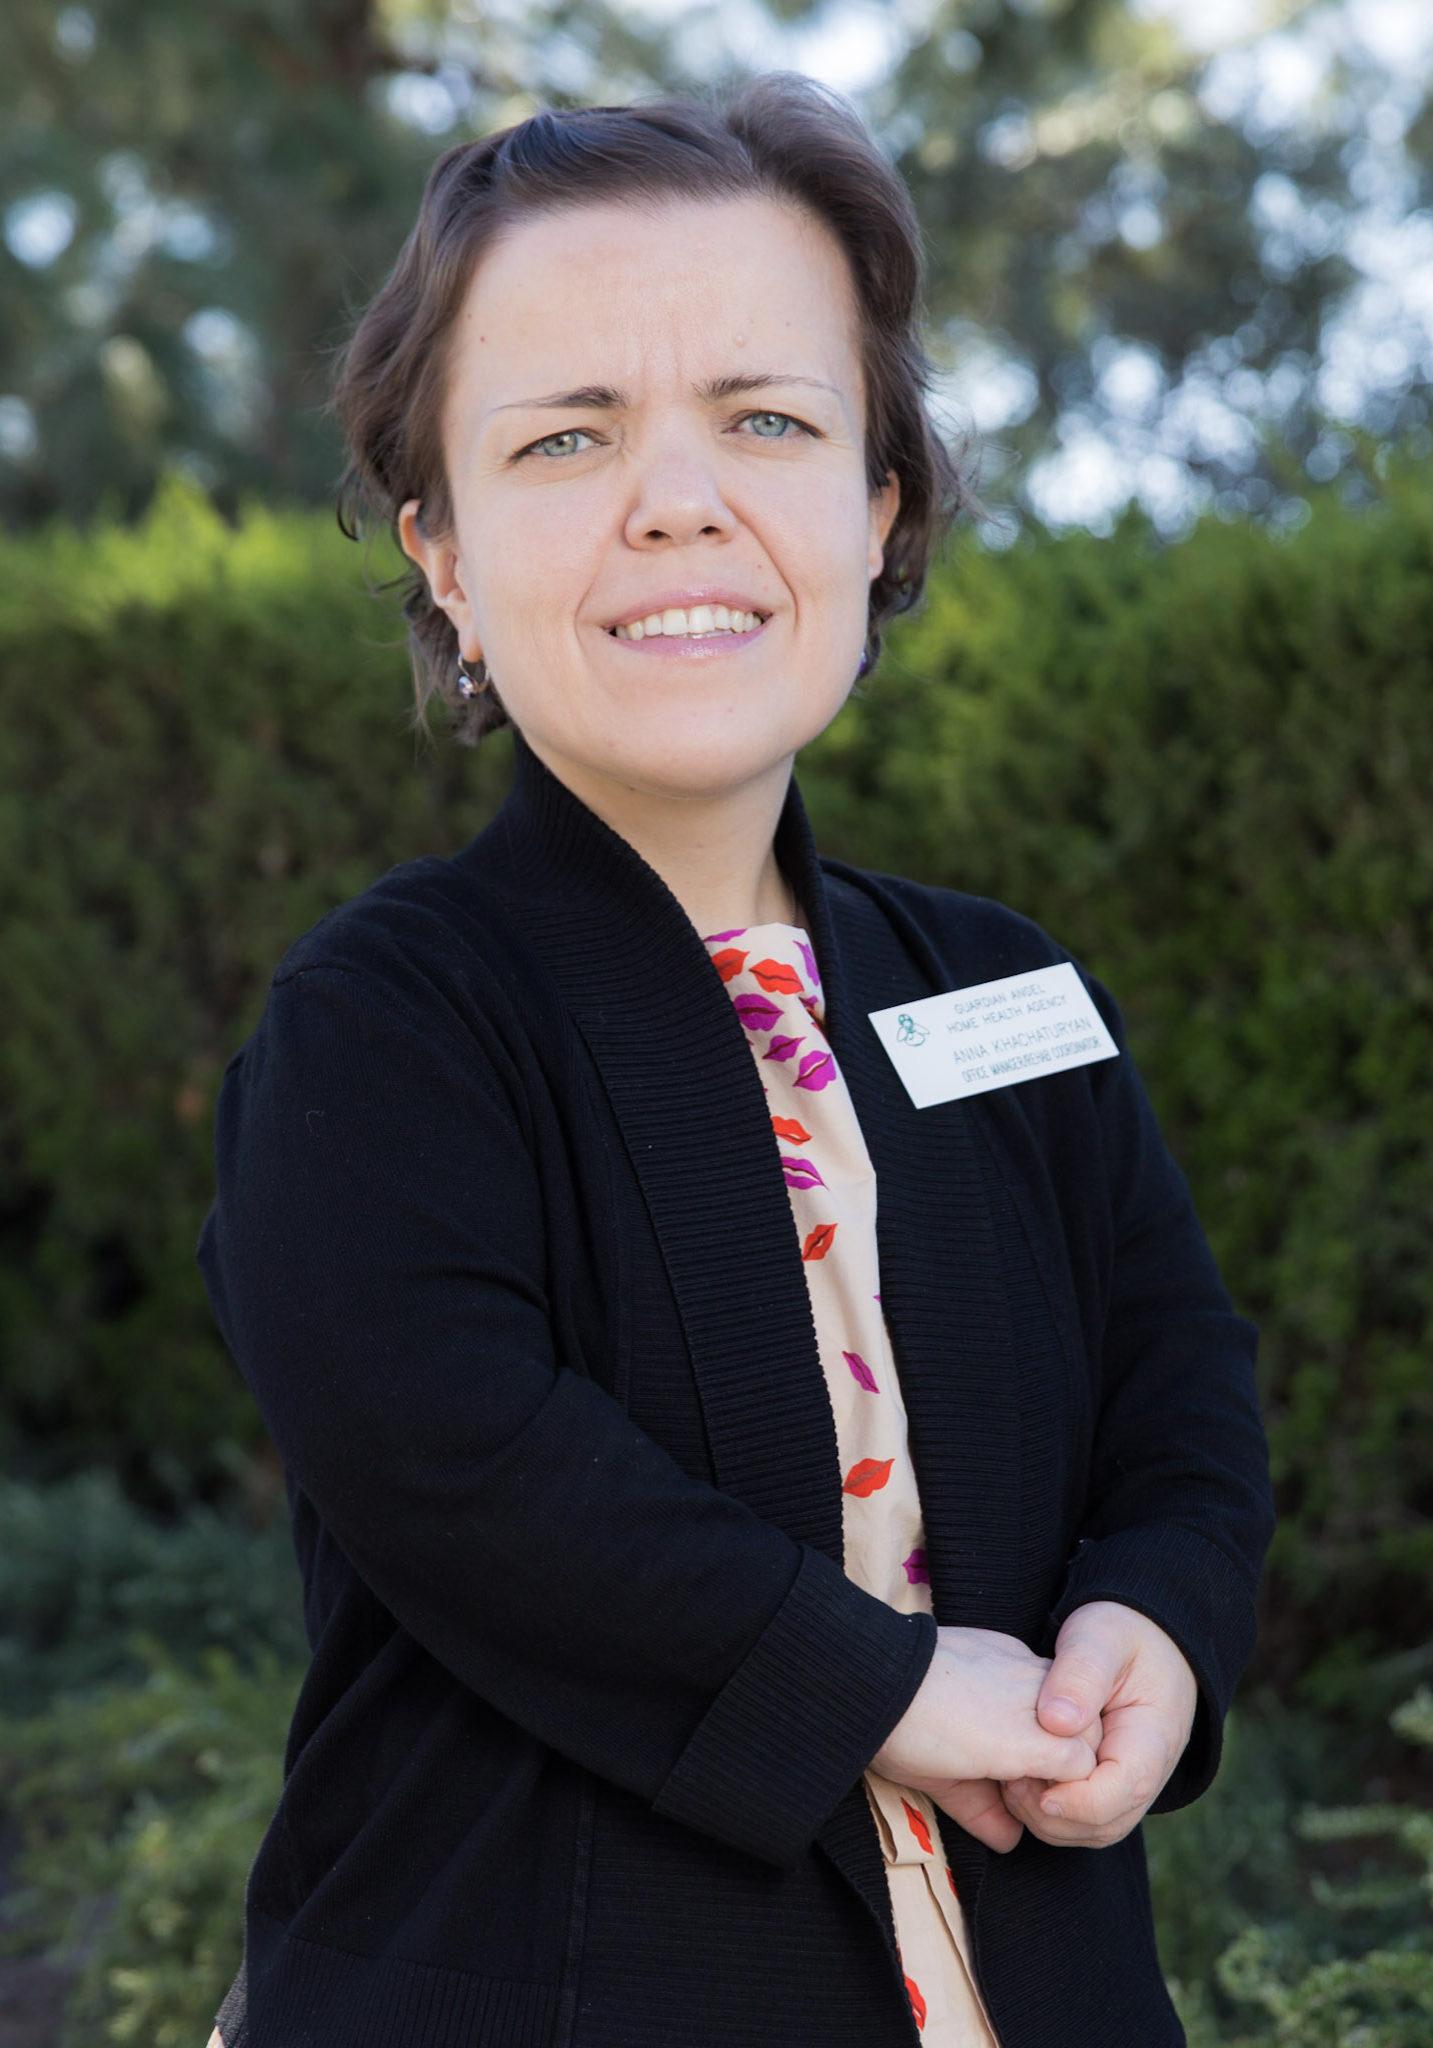 Anna Khachaturyan Office Manager & Intake Coordinator